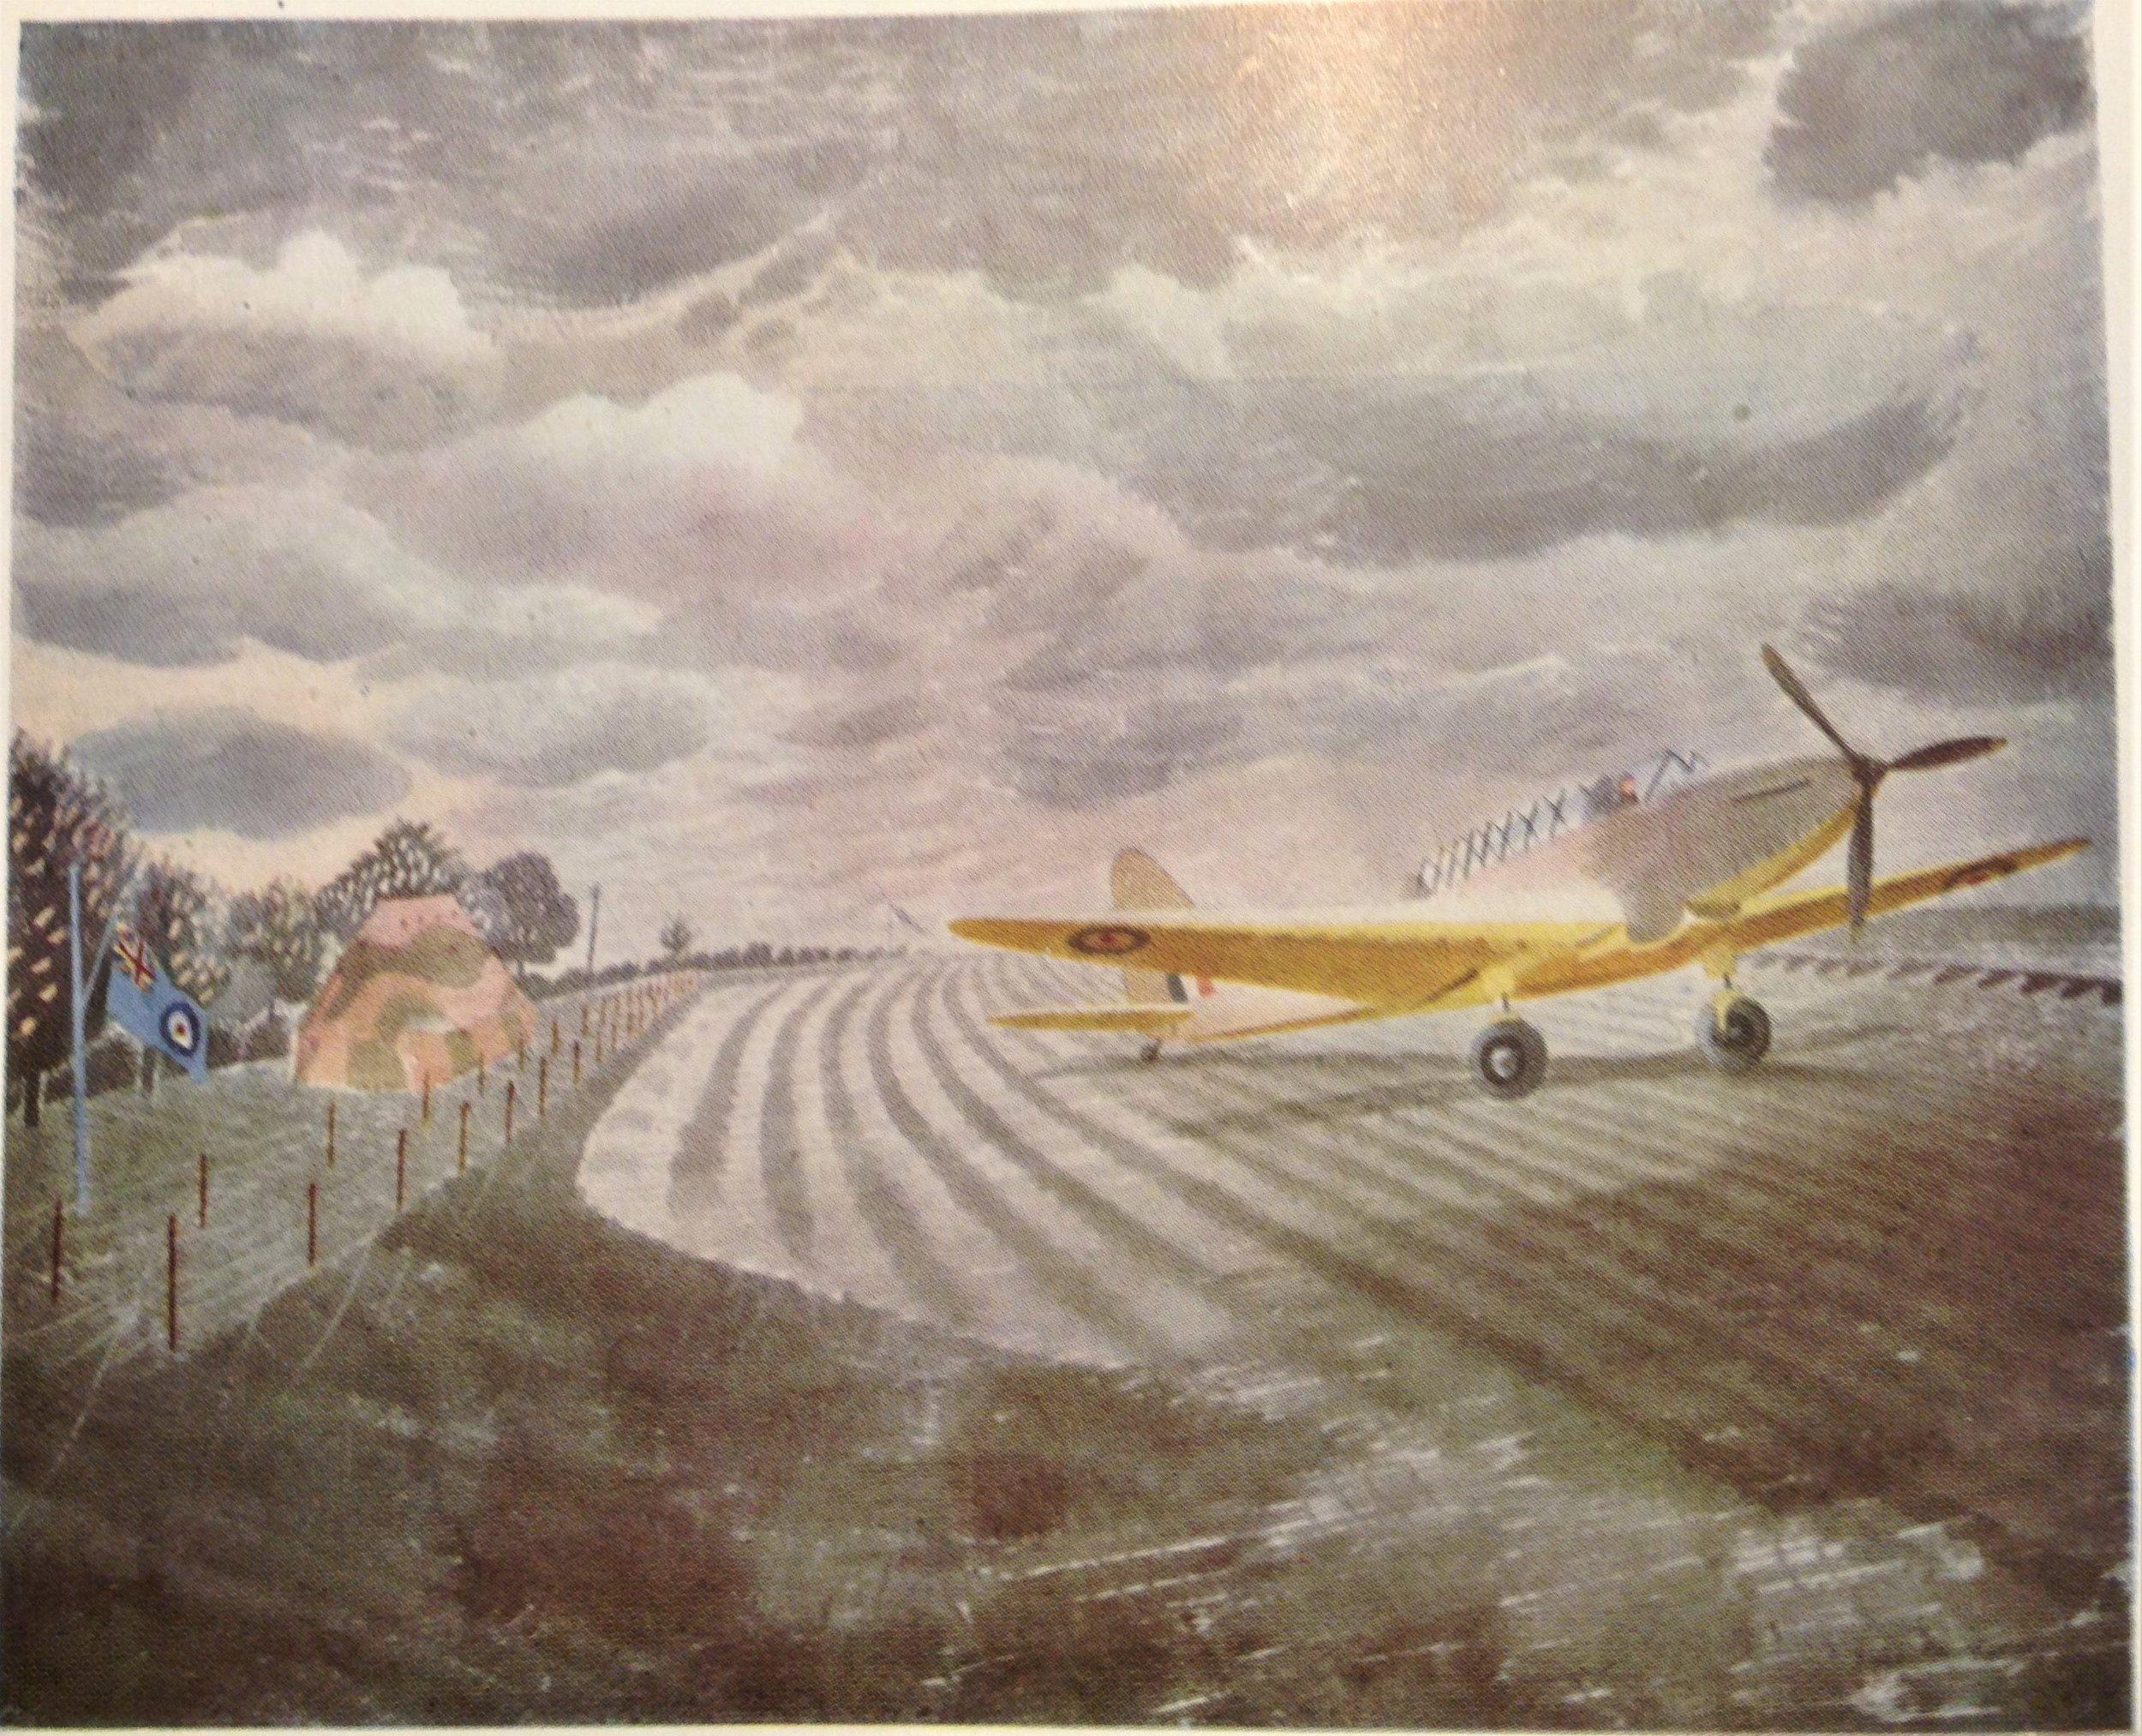 Fairey Battle (1942)